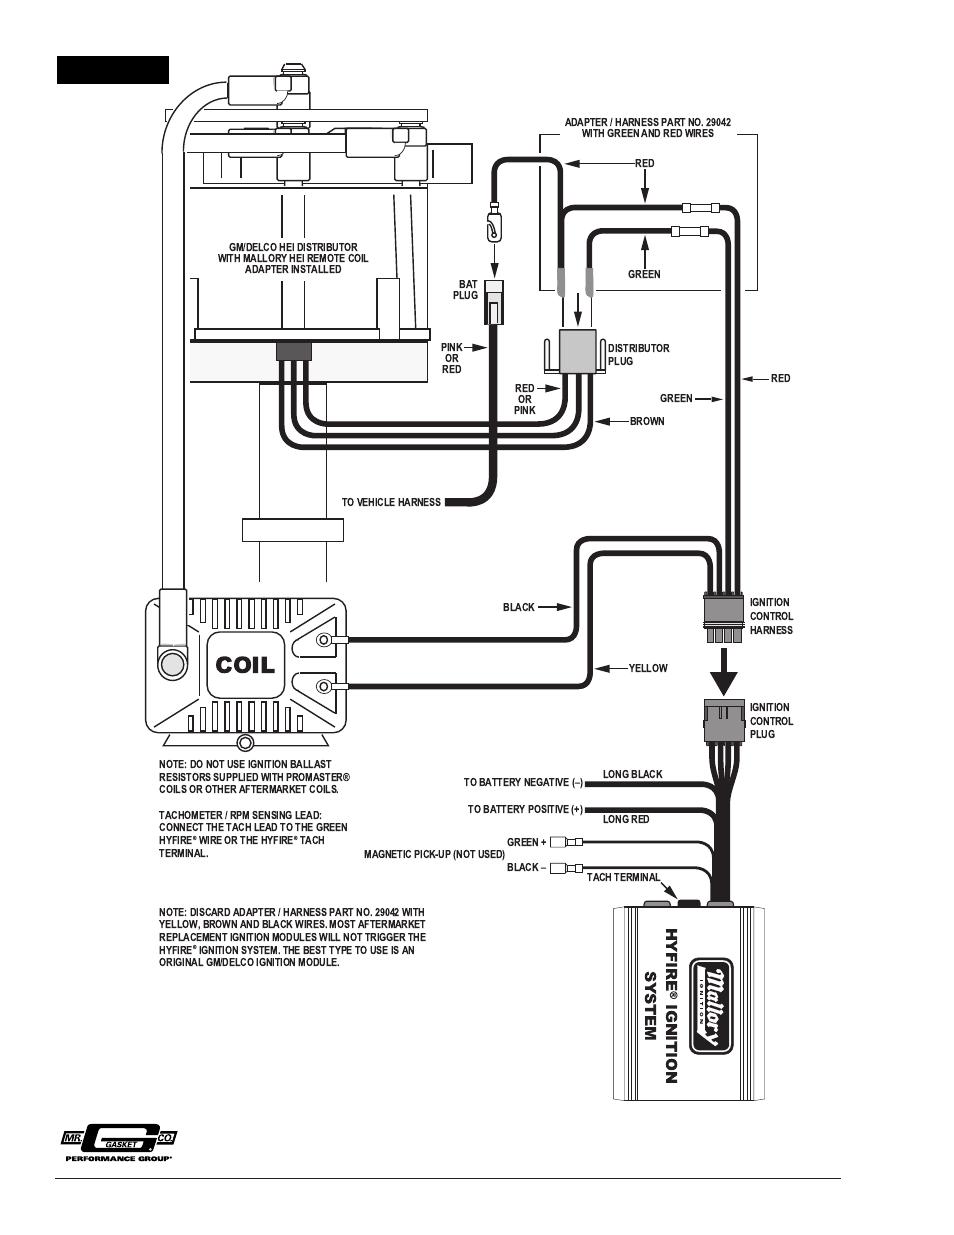 Accel 59107 Hei Distributor Wiring Diagram Libraries Dist Simple Diagramsaccel Points Eliminator Third